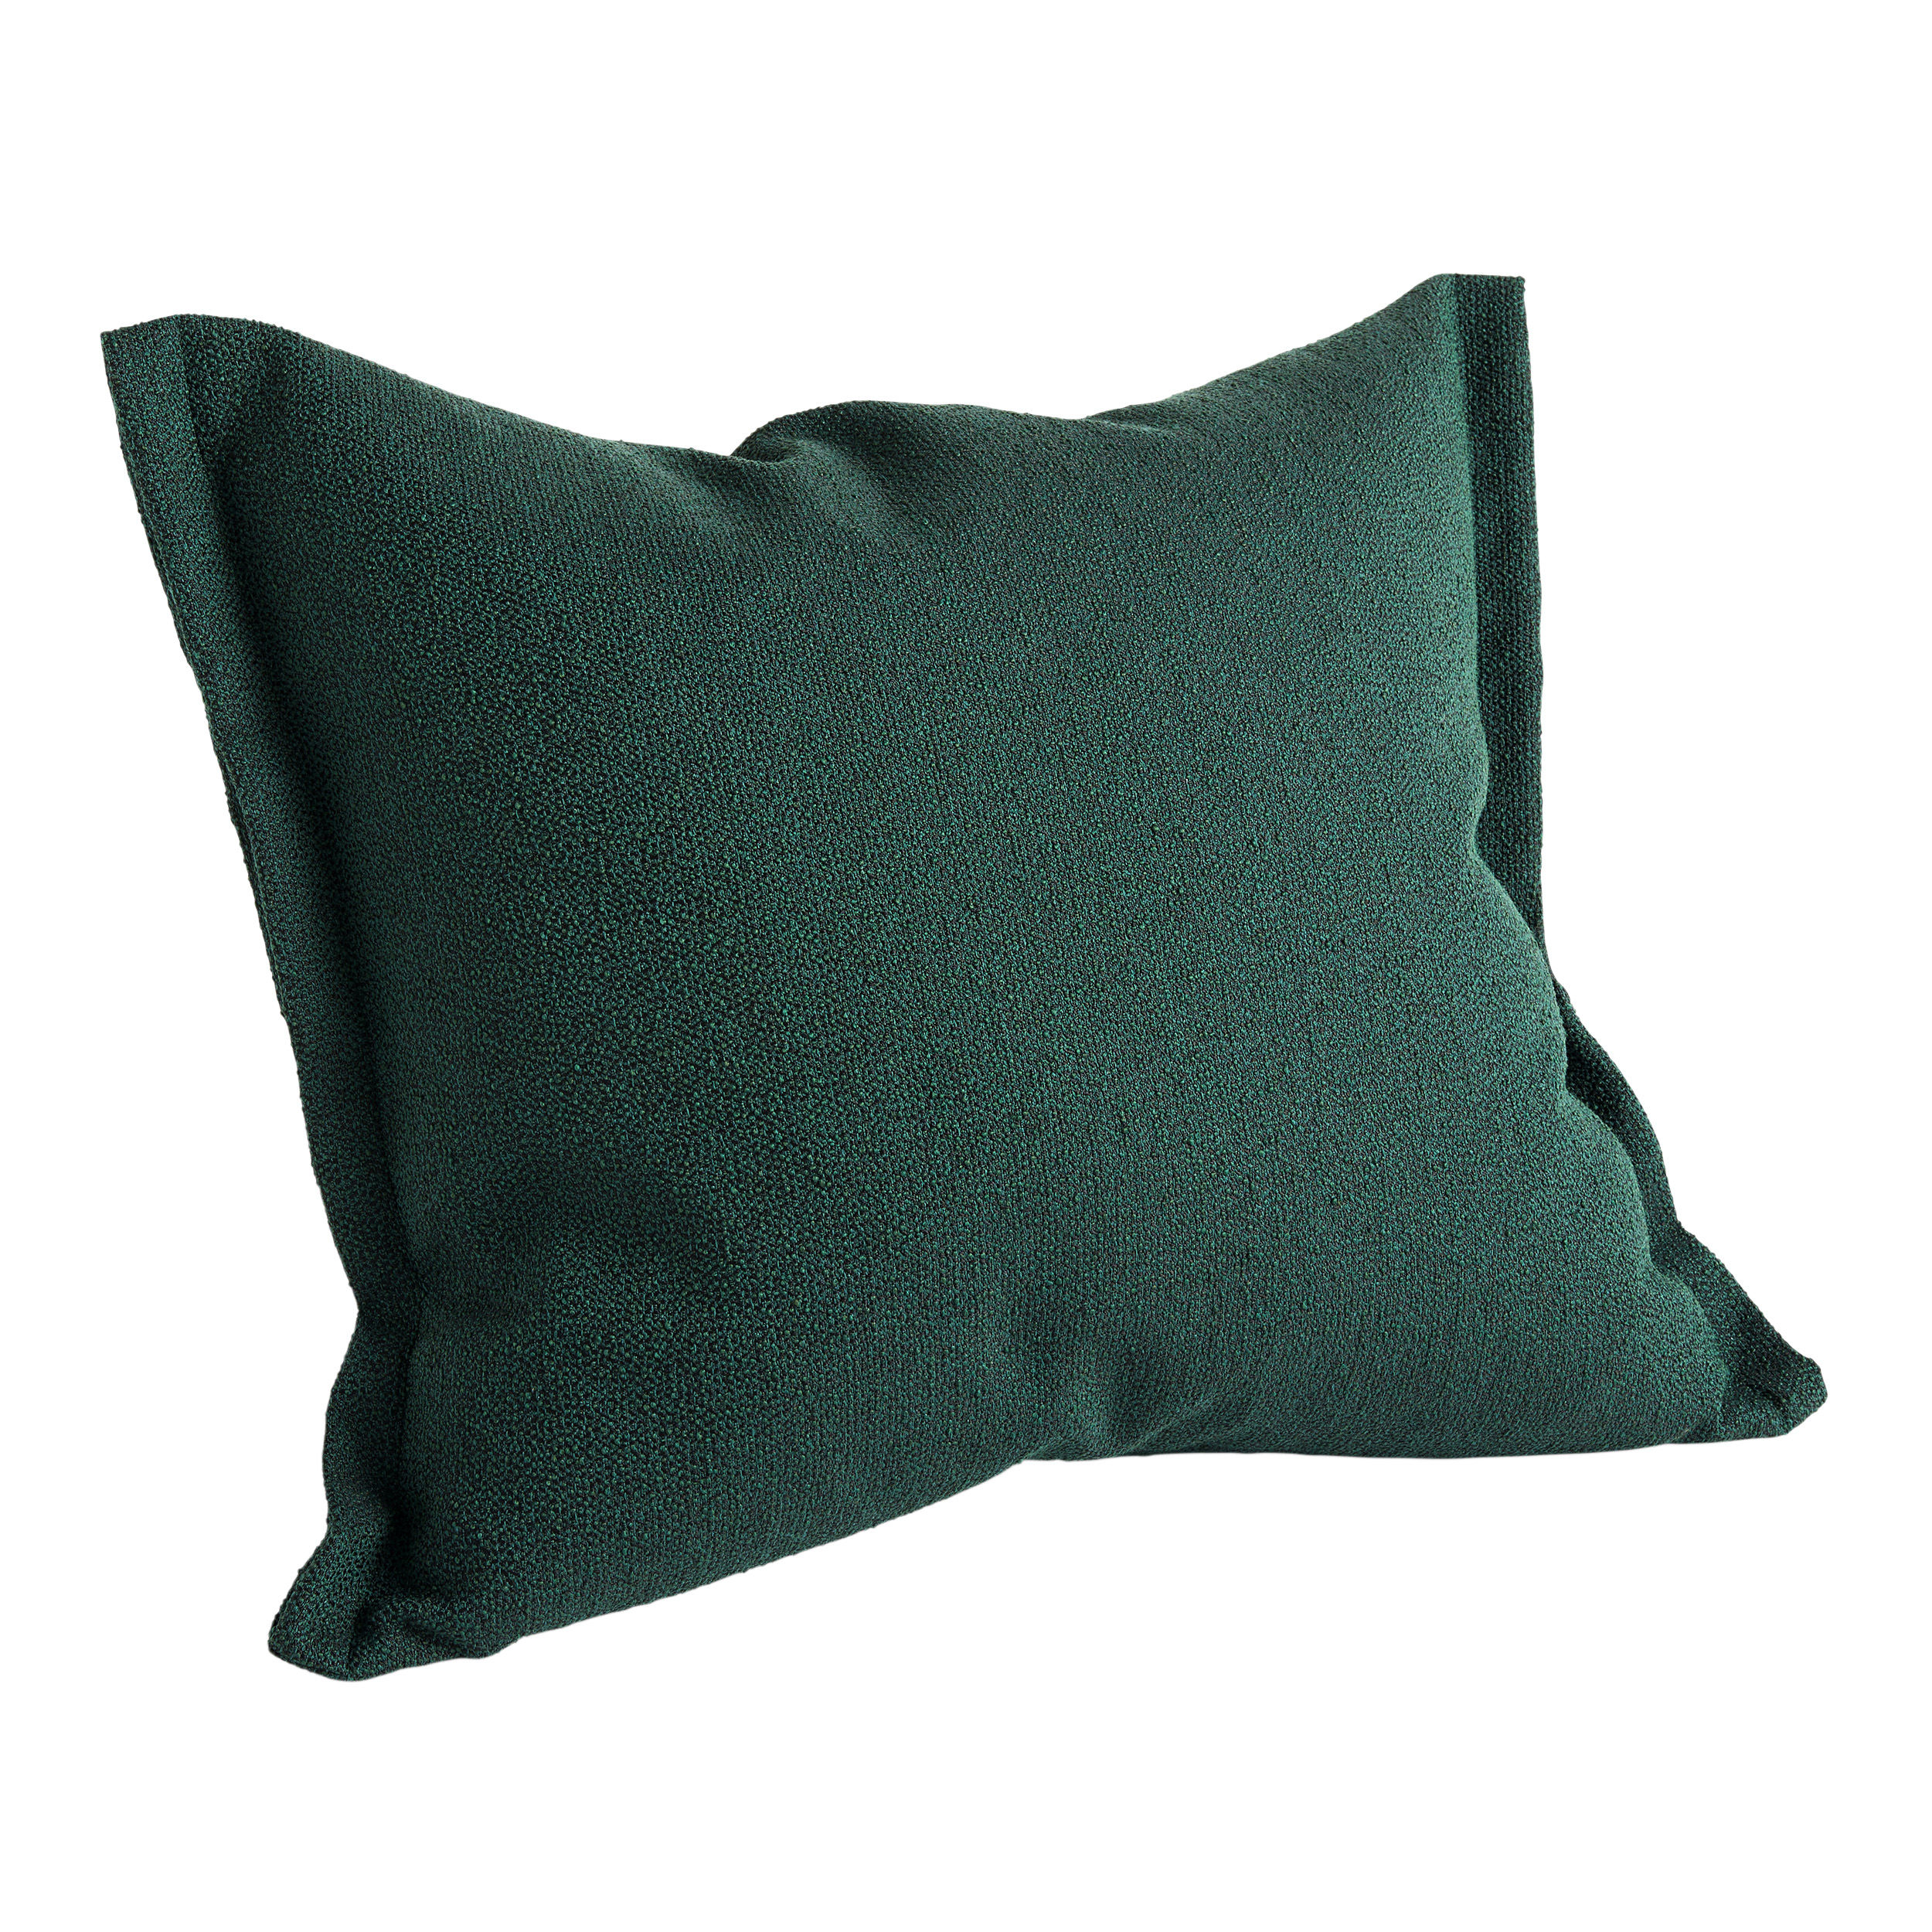 Dekoration - Kissen - Plica Sprinkle Kissen / 60 x 55 cm - Hay - Dunkelgrün - Baumwolle, Polyacryl, Polyesterfaser